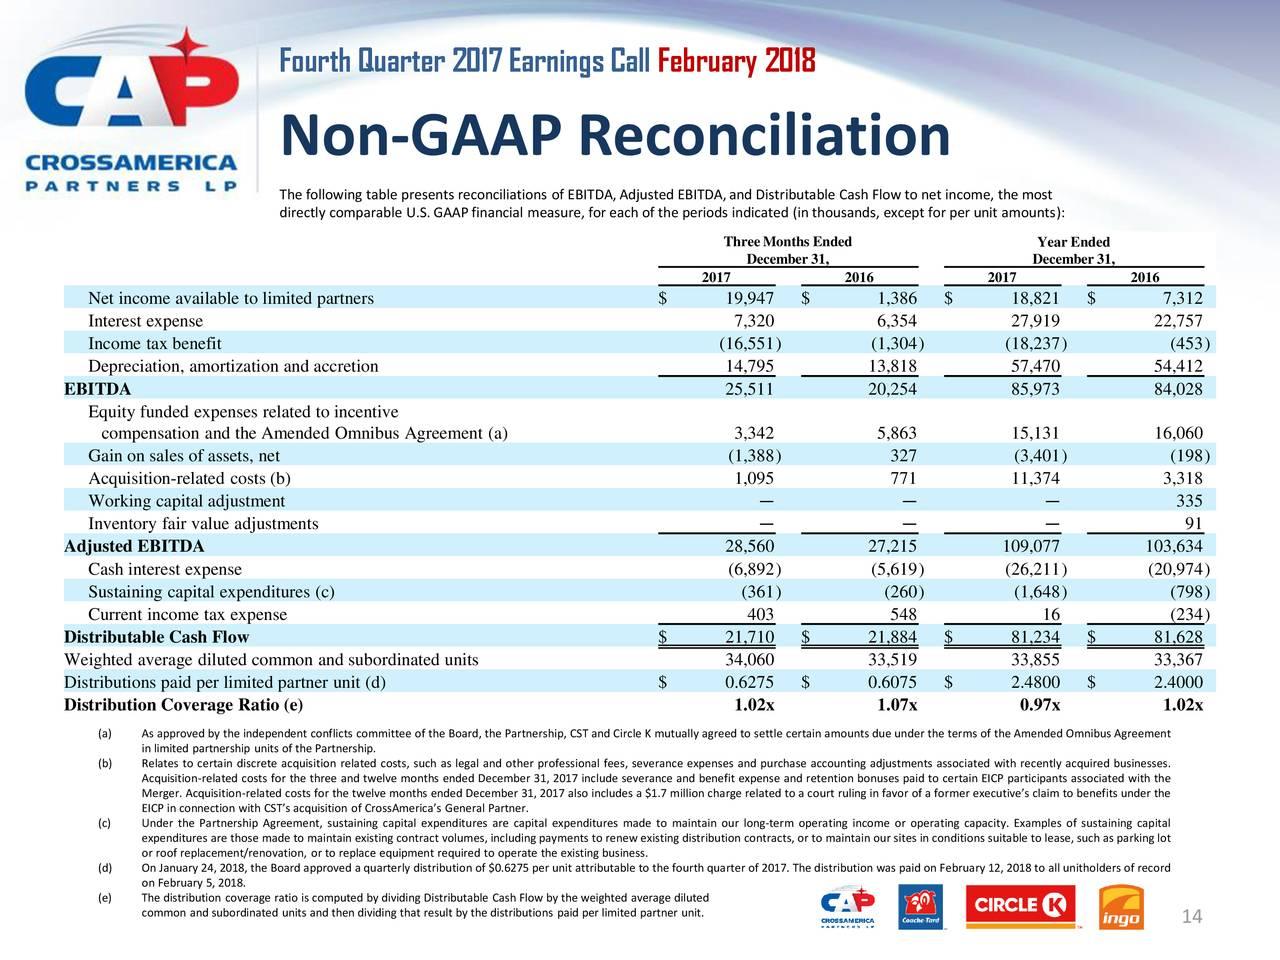 sample reconciliation adjustment including legal fees